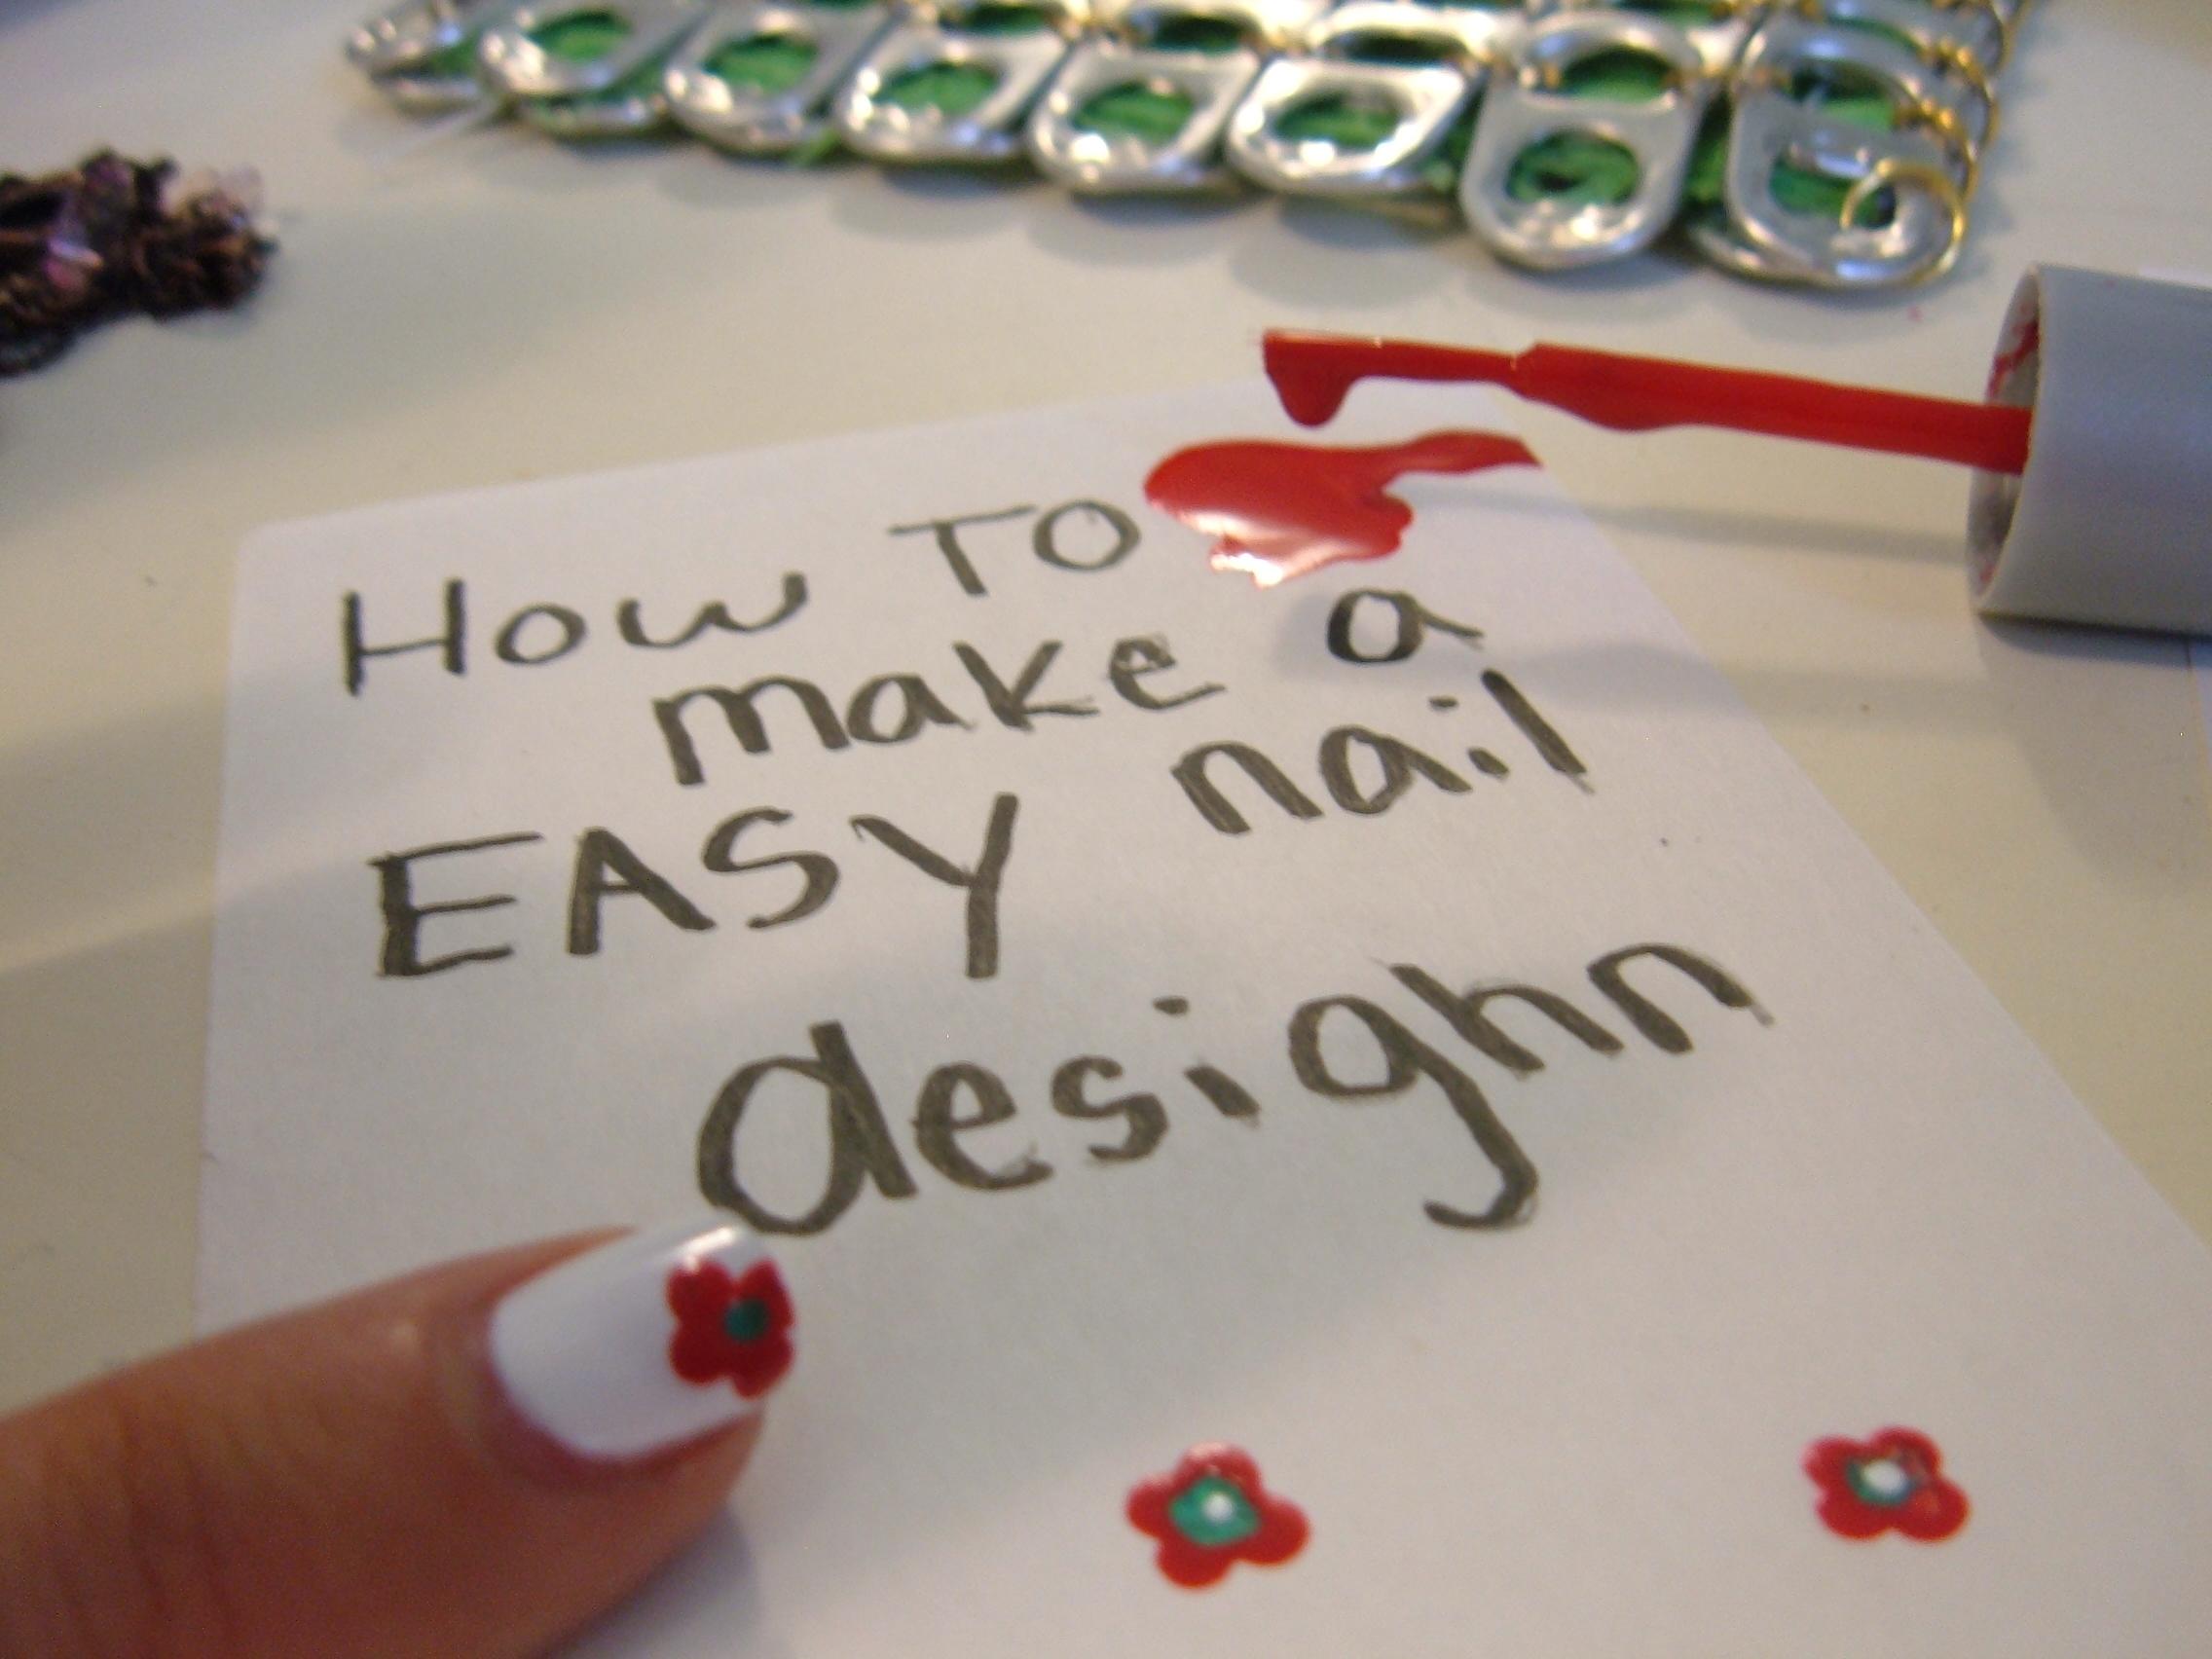 how to make a easy nail desighn